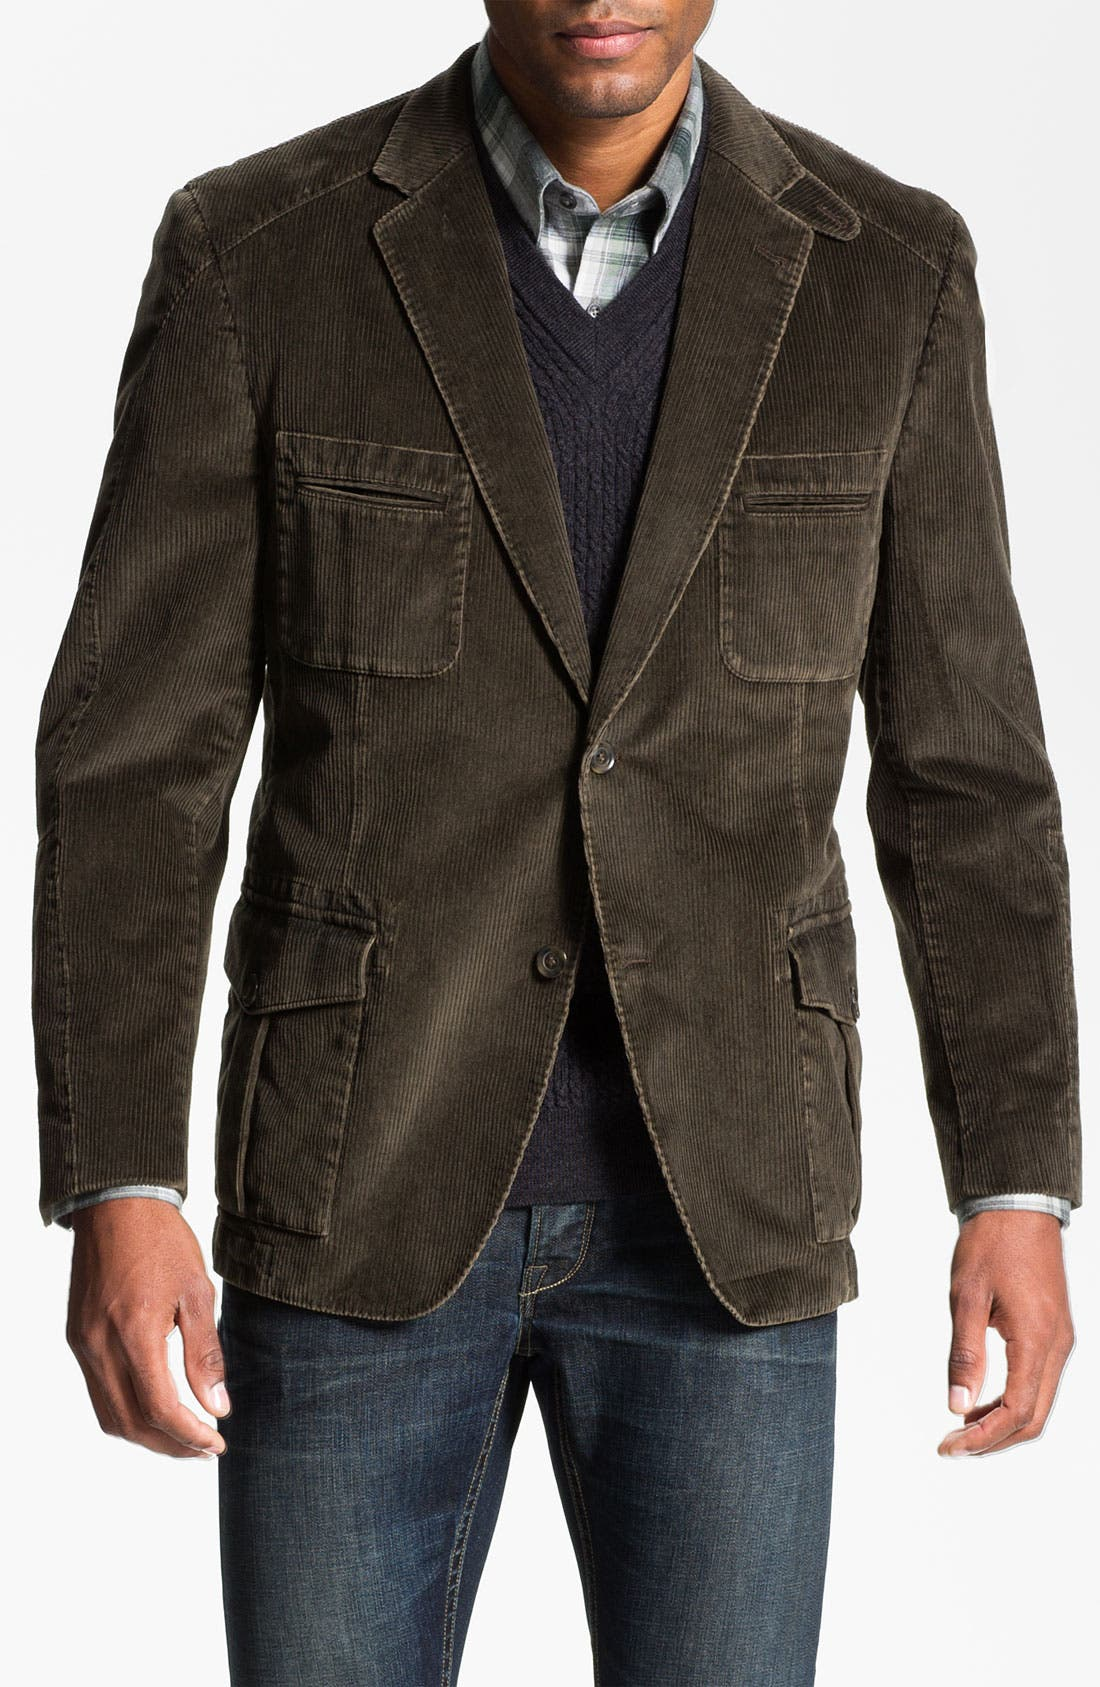 Alternate Image 1 Selected - Kroon 'Matthews' Washed Corduroy Sportcoat